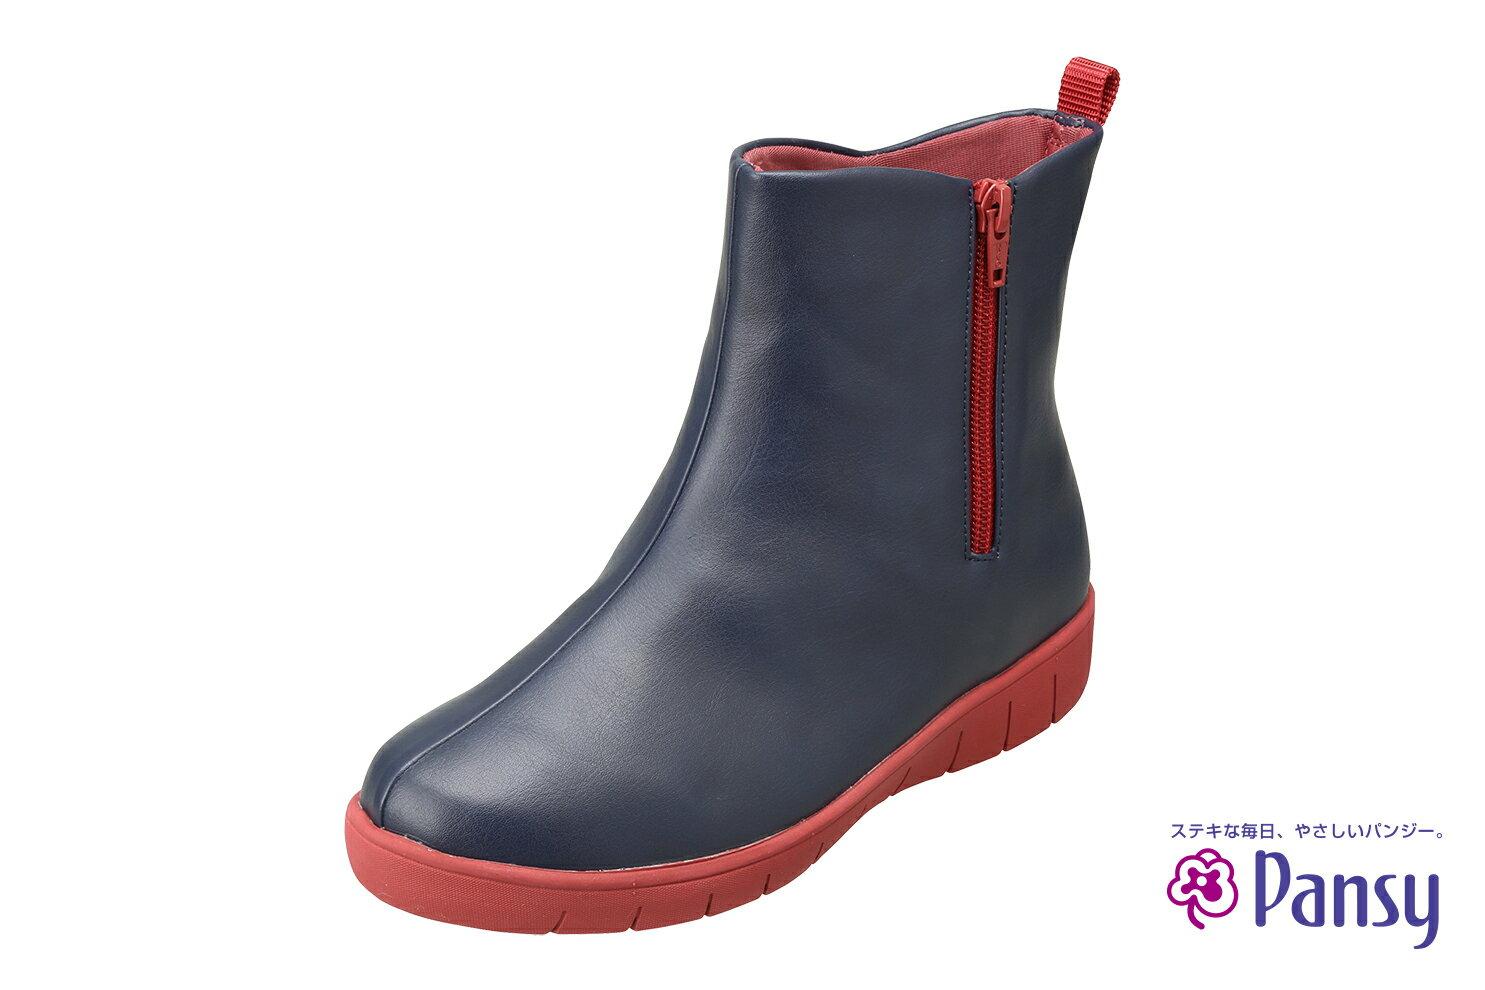 PANSY 女性 時尚撞色 短筒雨鞋 QA4944 6